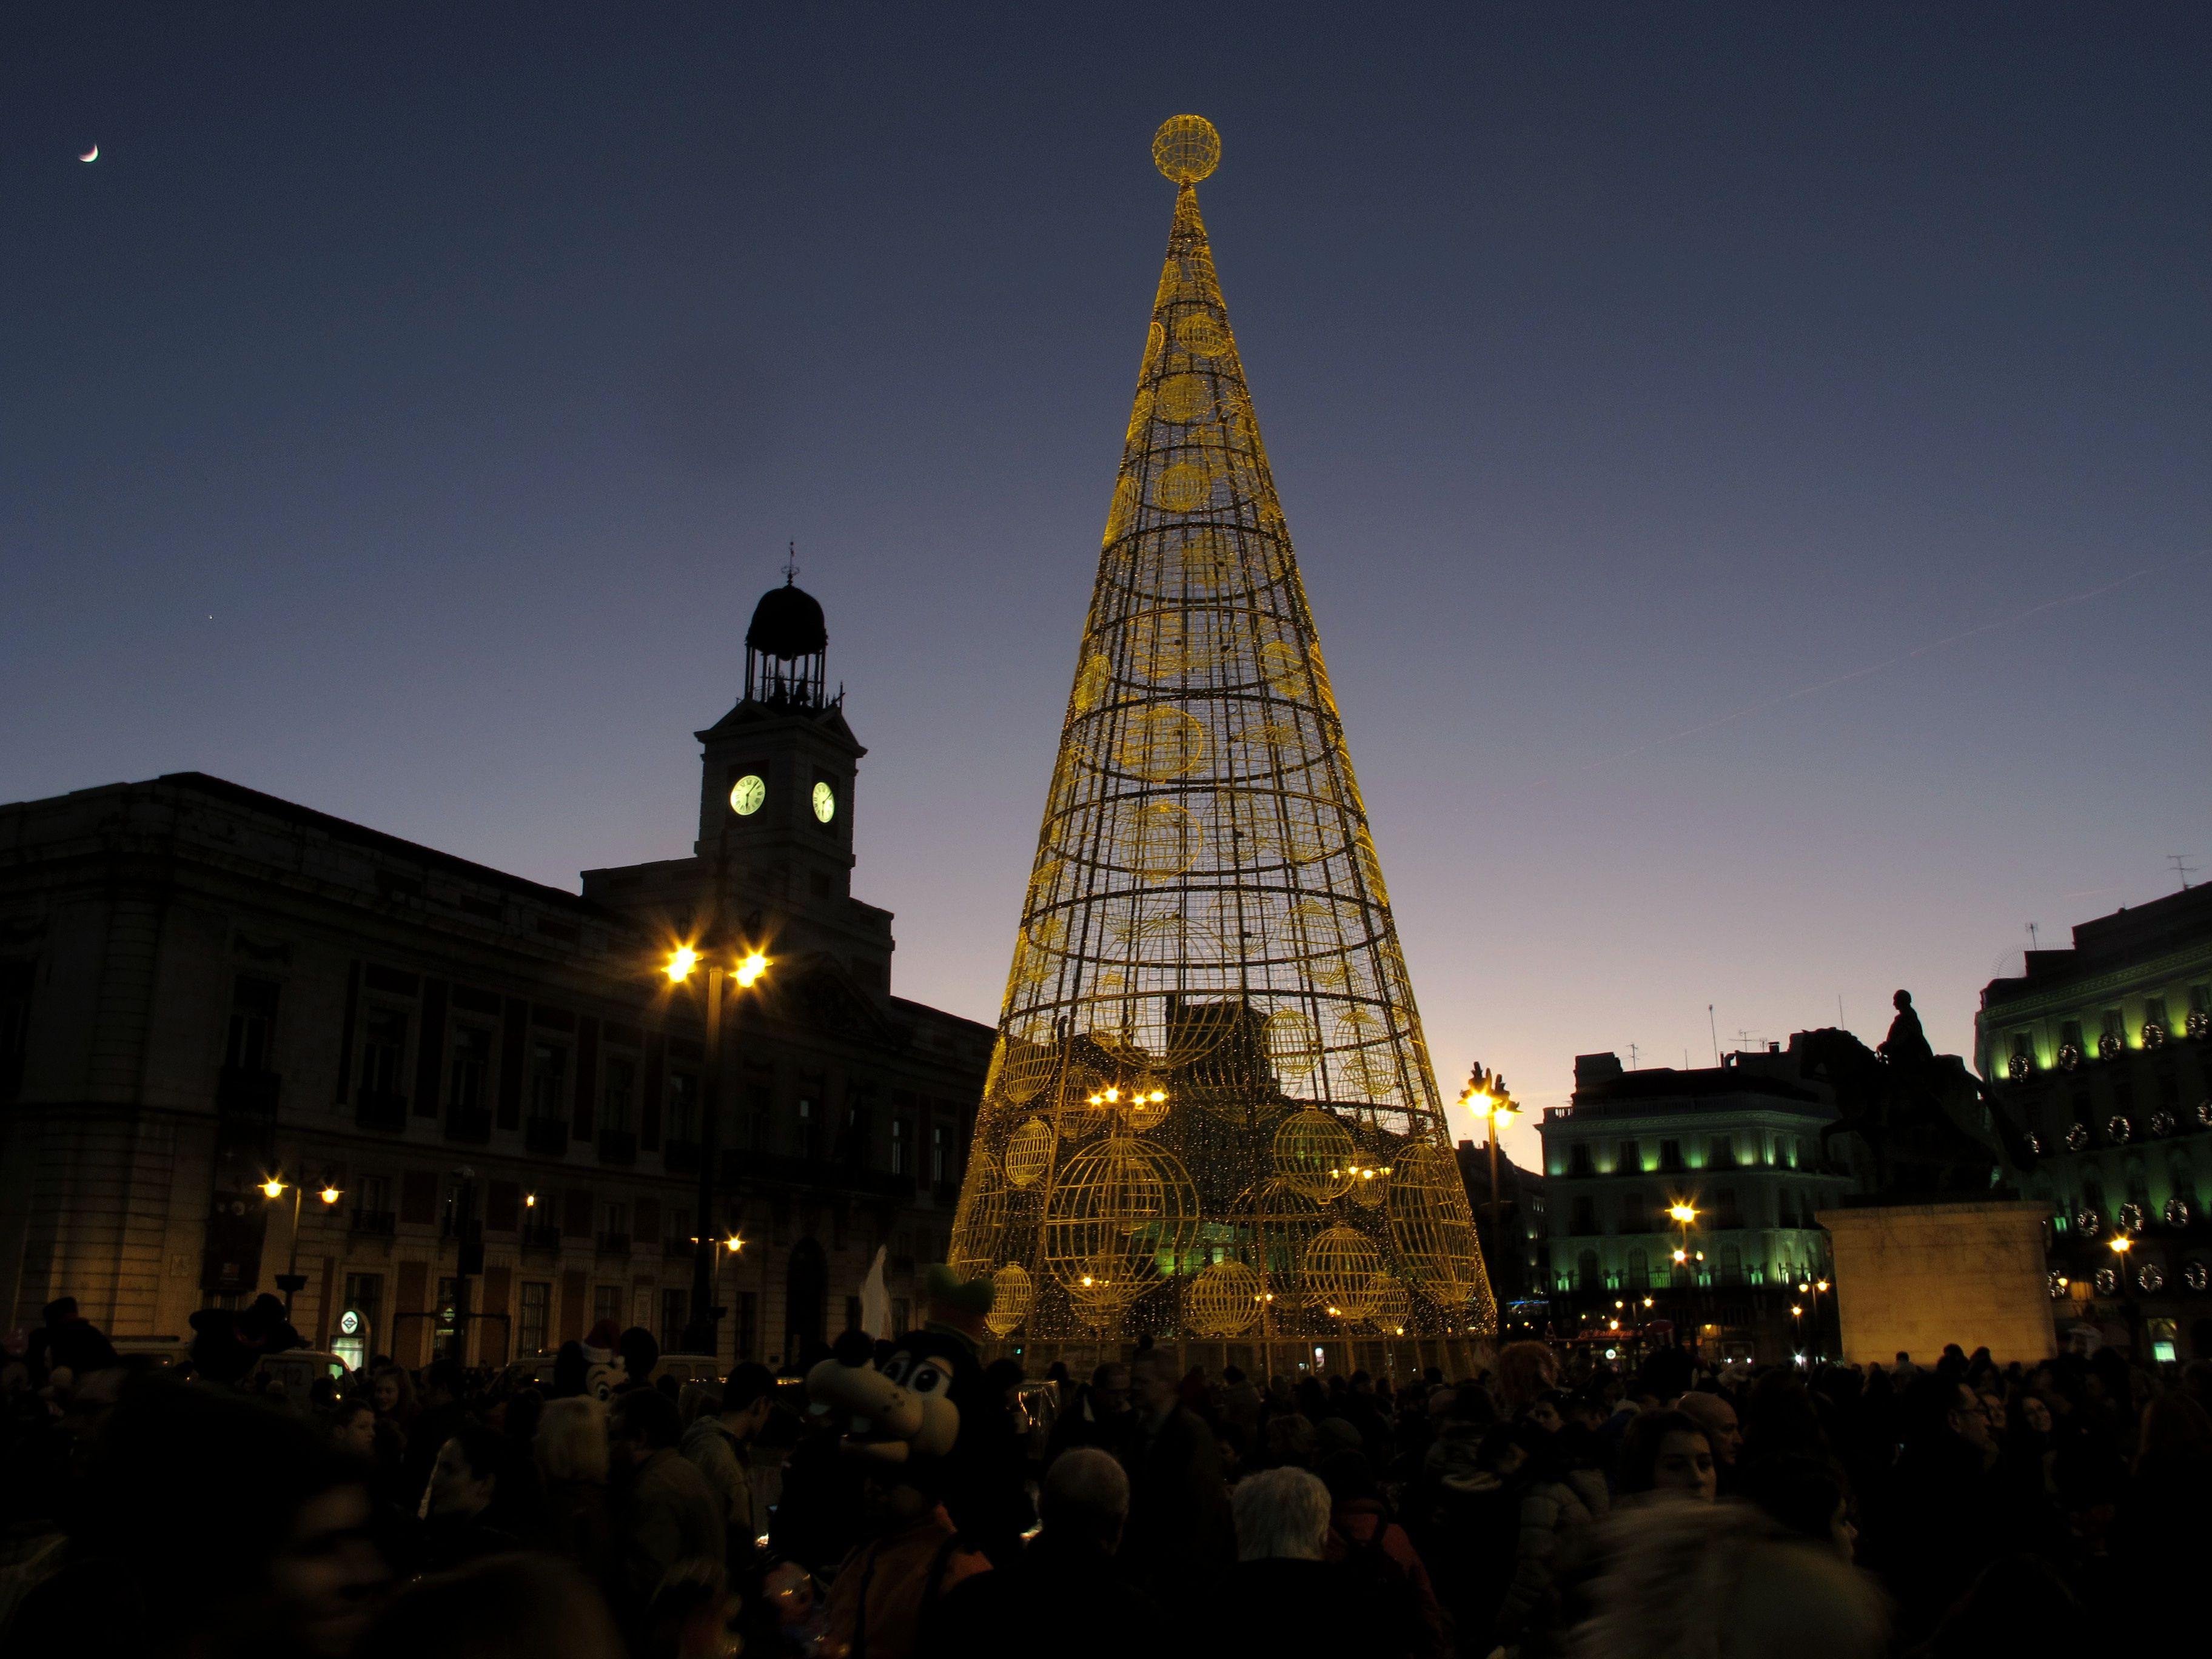 Celebrating Christmas in Madrid